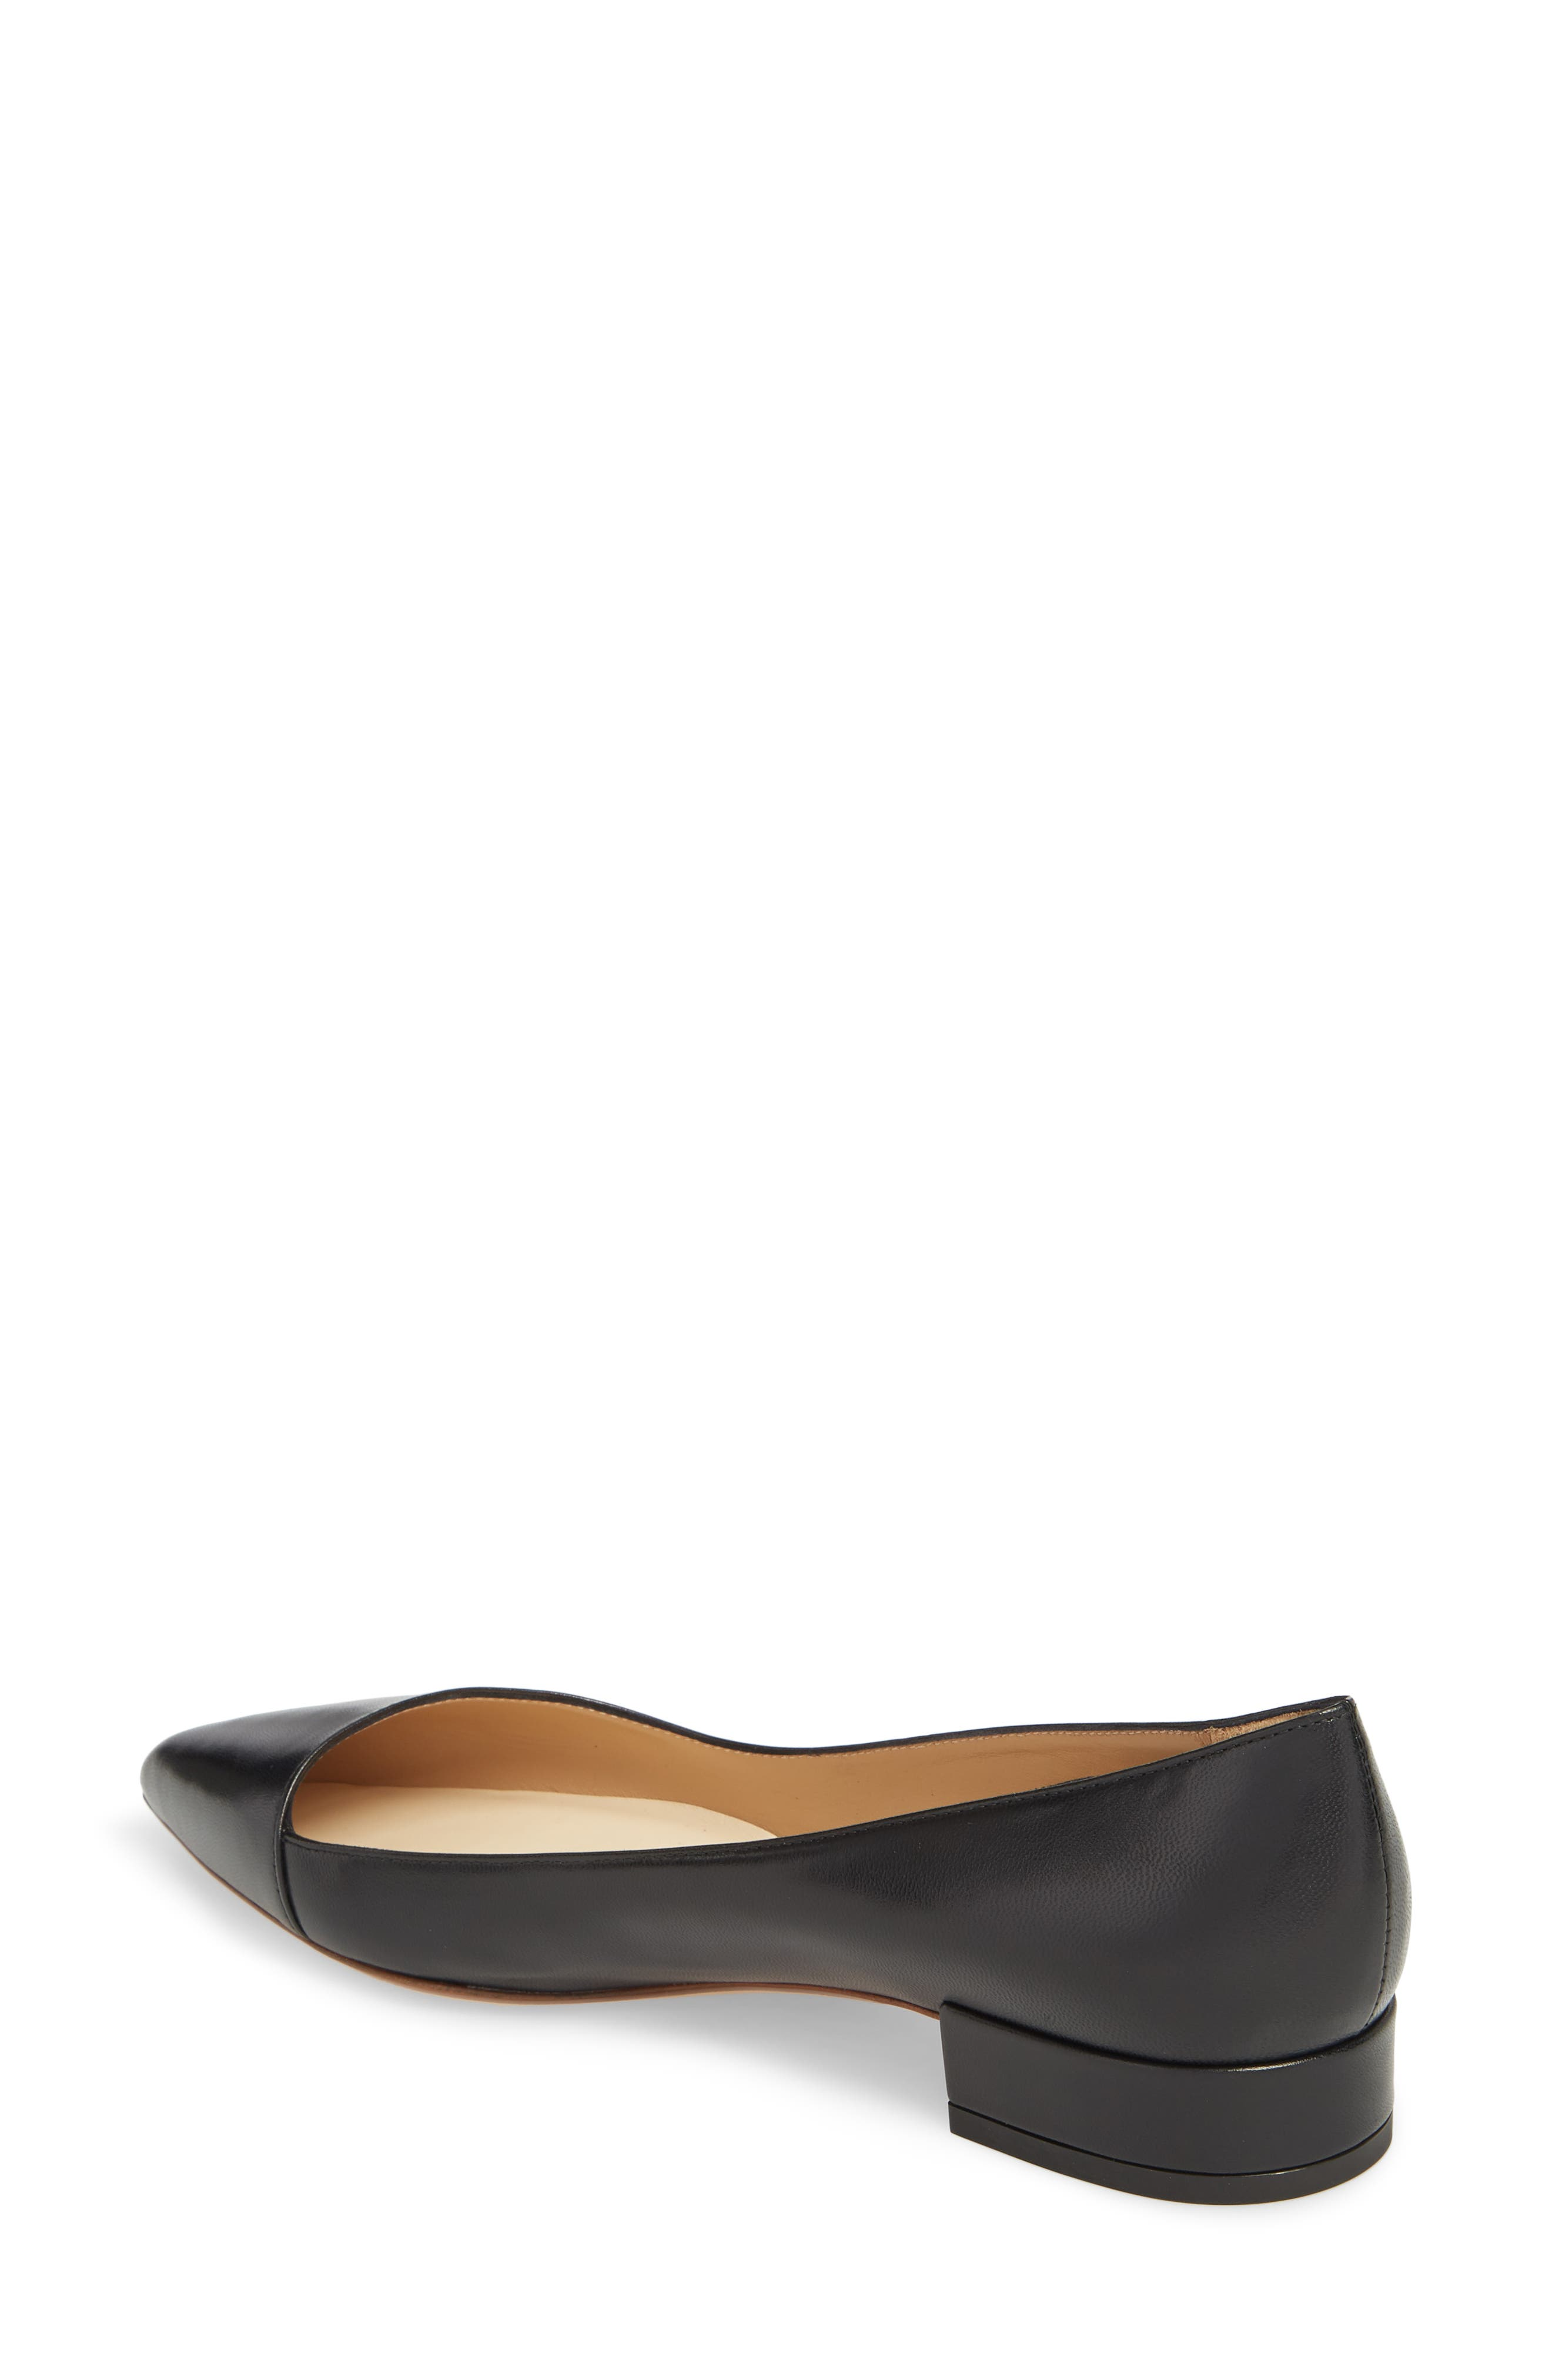 FRANCESCO RUSSO, Asymmetric Pointy Toe Flat, Alternate thumbnail 2, color, BLACK